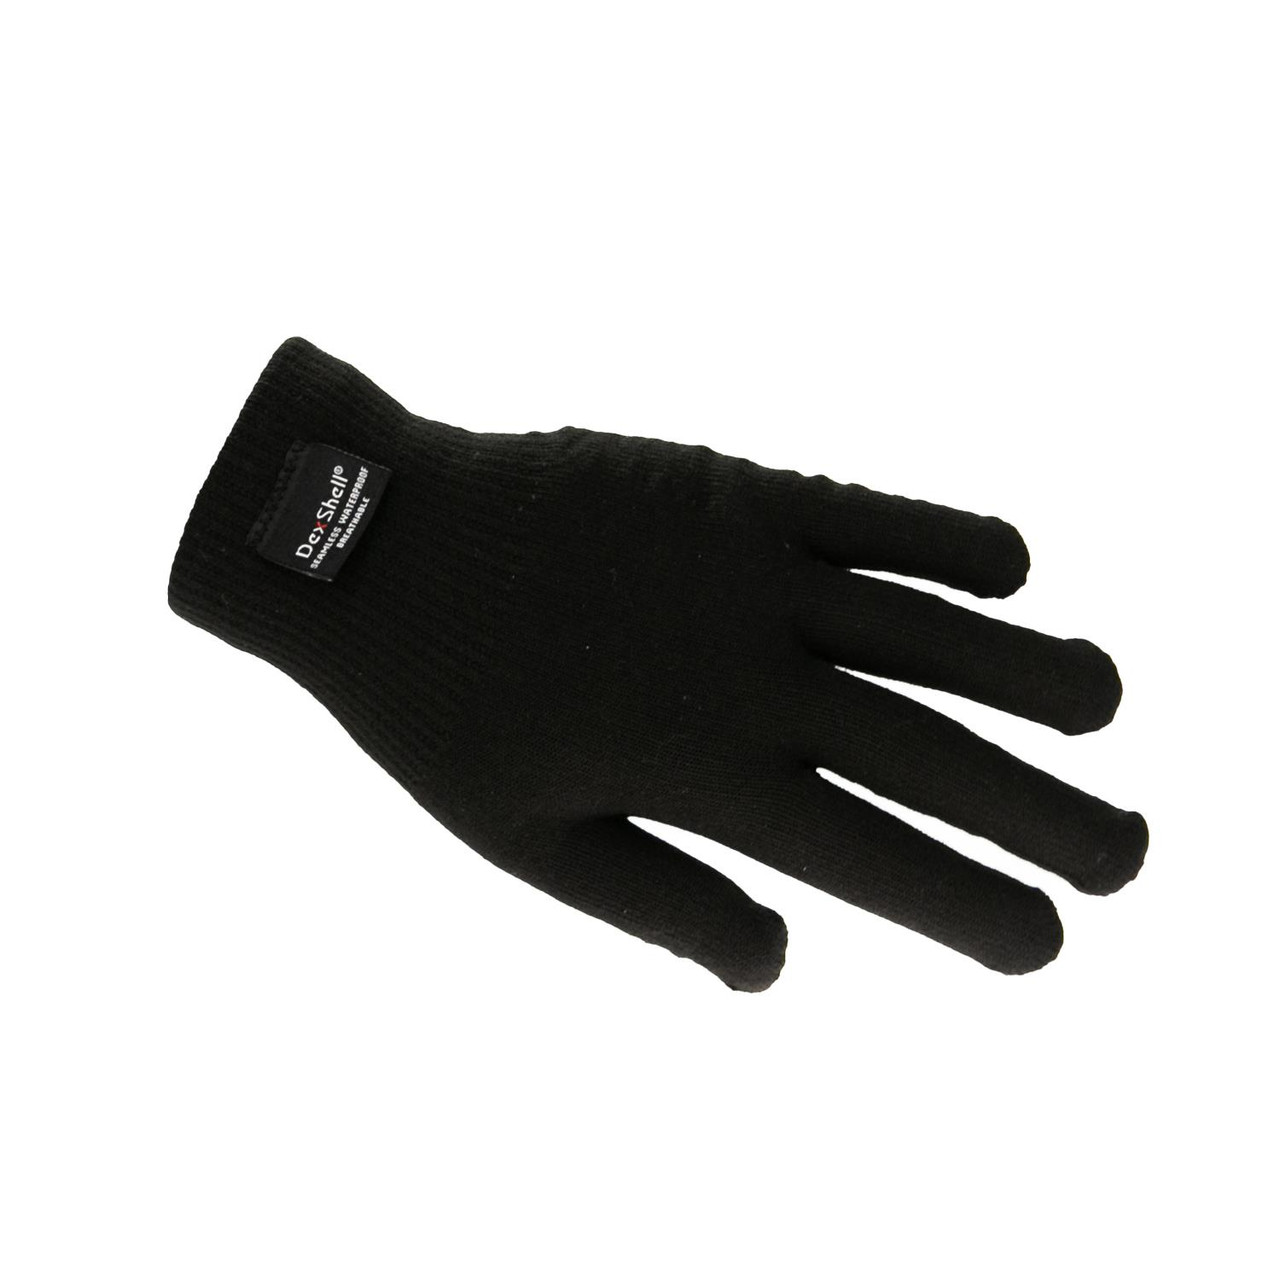 DexShell Touchfit Waterproof Gloves, Small